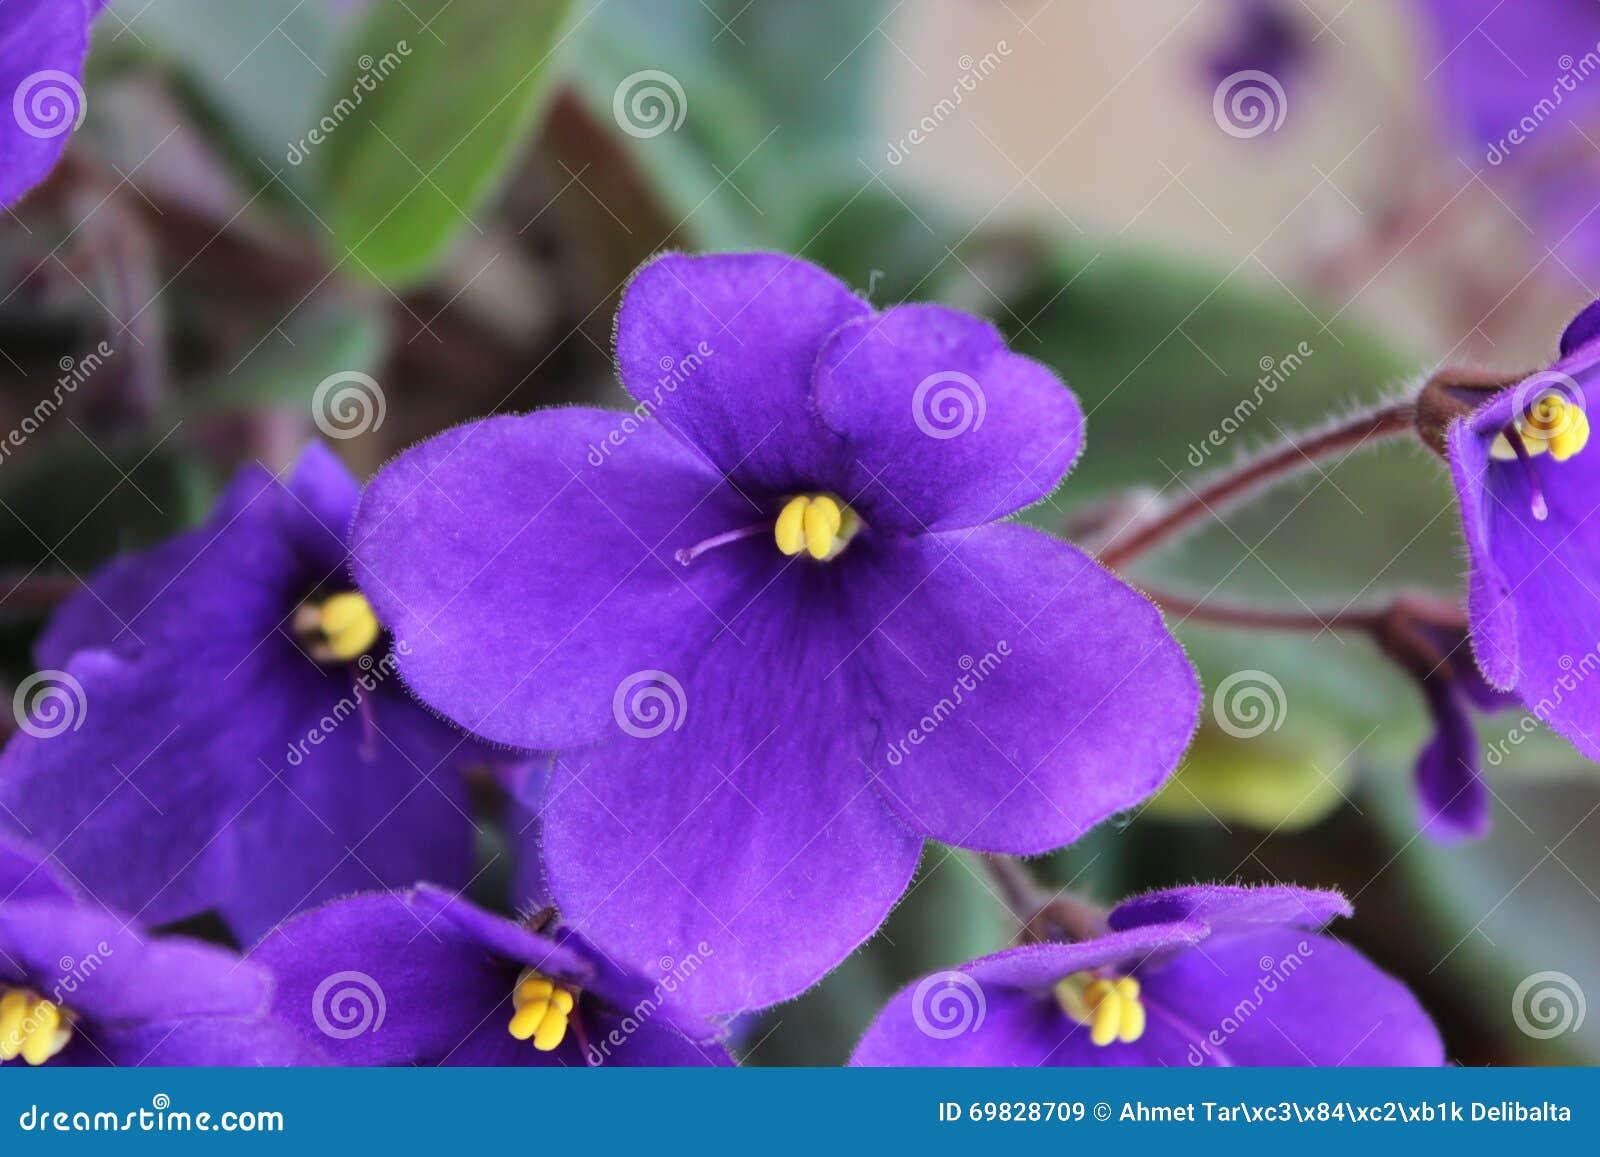 Purple Flower Stock Image Image Of Purple Fresh Background 69828709